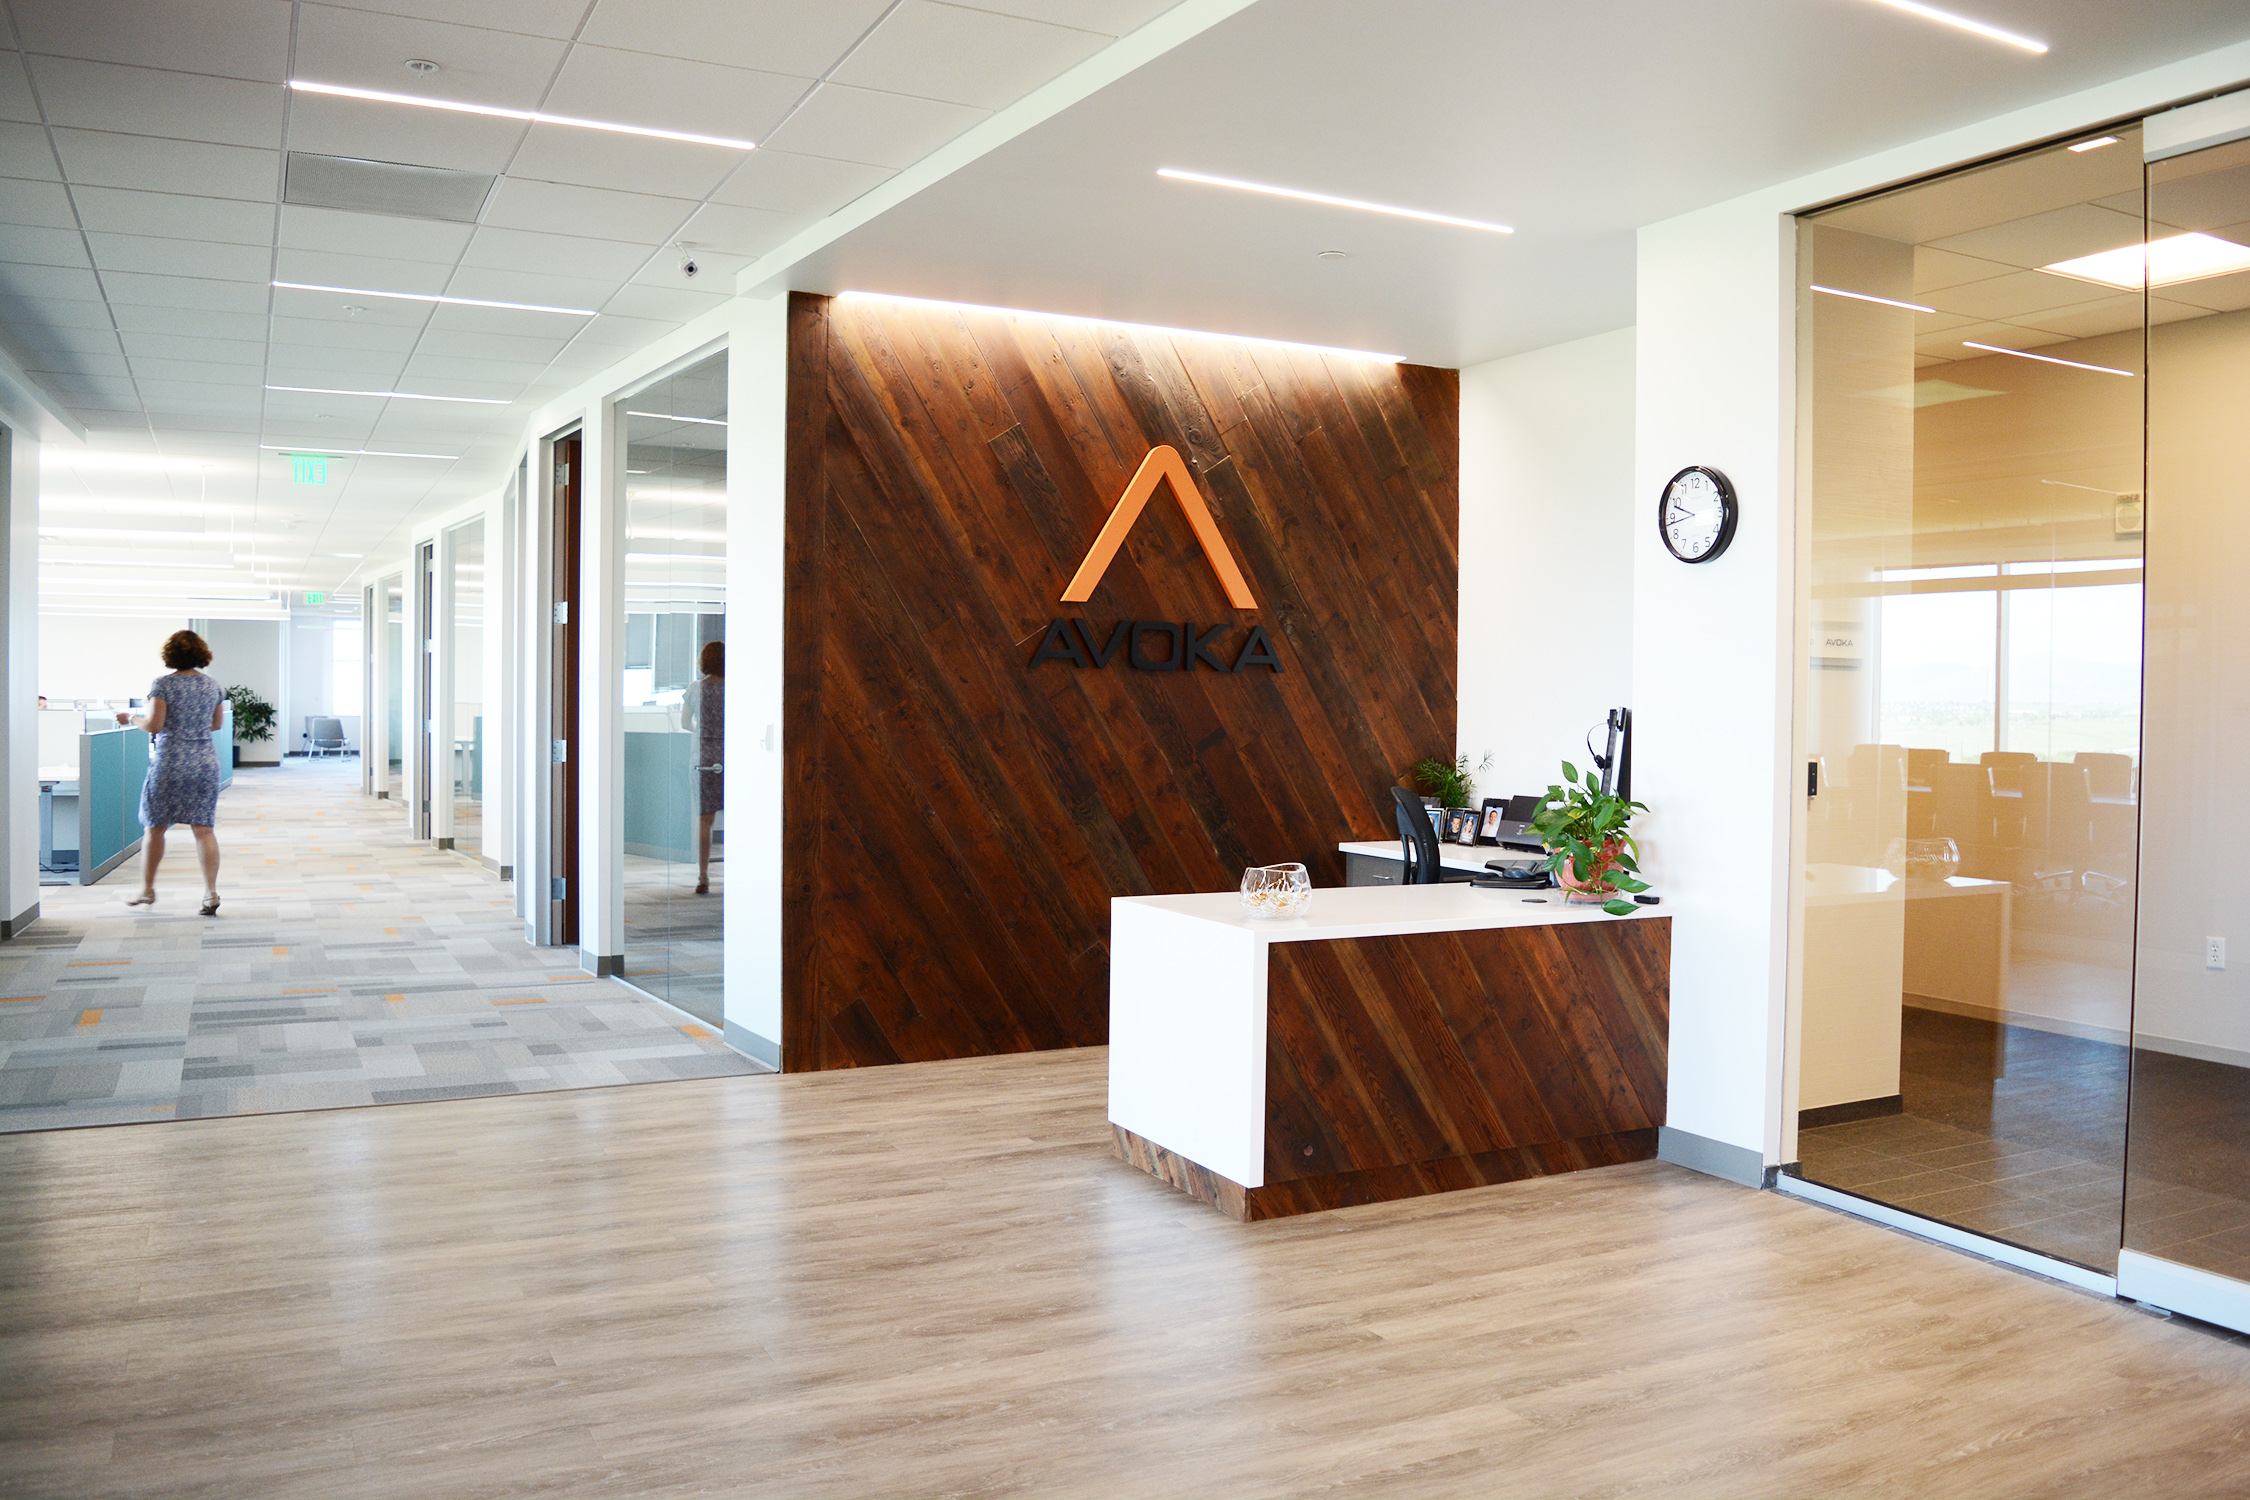 Australian Tech Firm Seeks Mountain Flair -